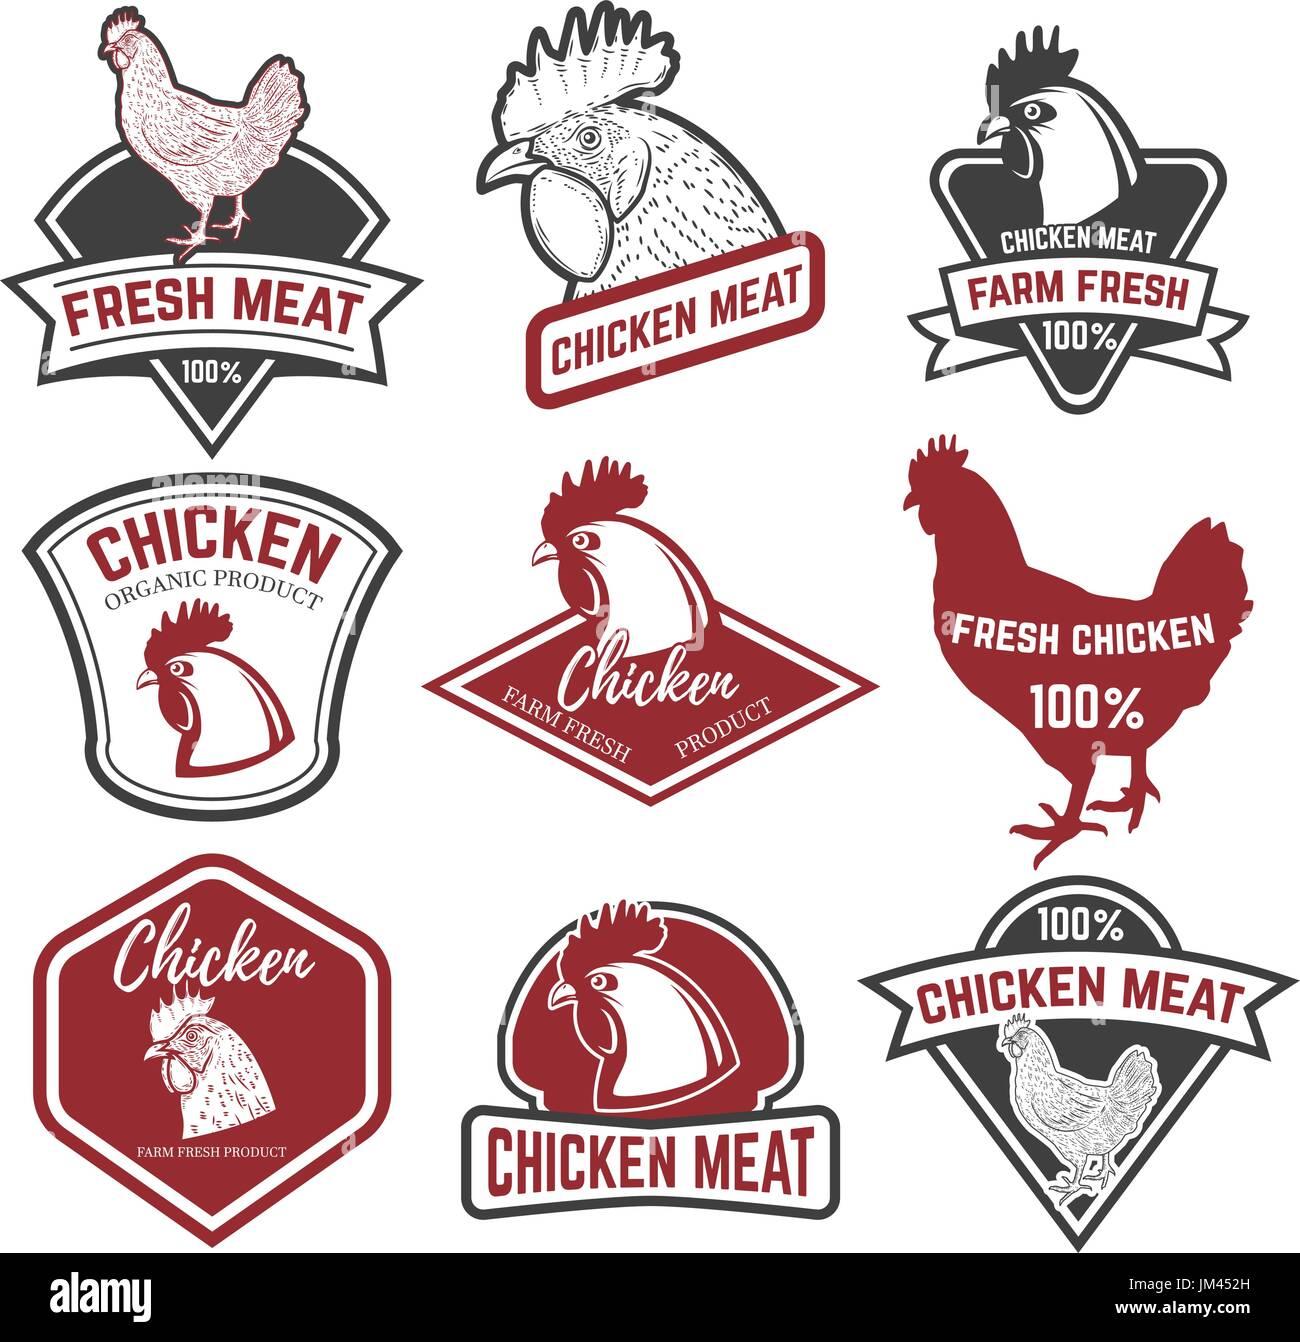 Chicken Vector Logo Farm Poultry Stock Photos Meat Diagram Symbol Set Of Labels Design Elements For Label Emblem Sign